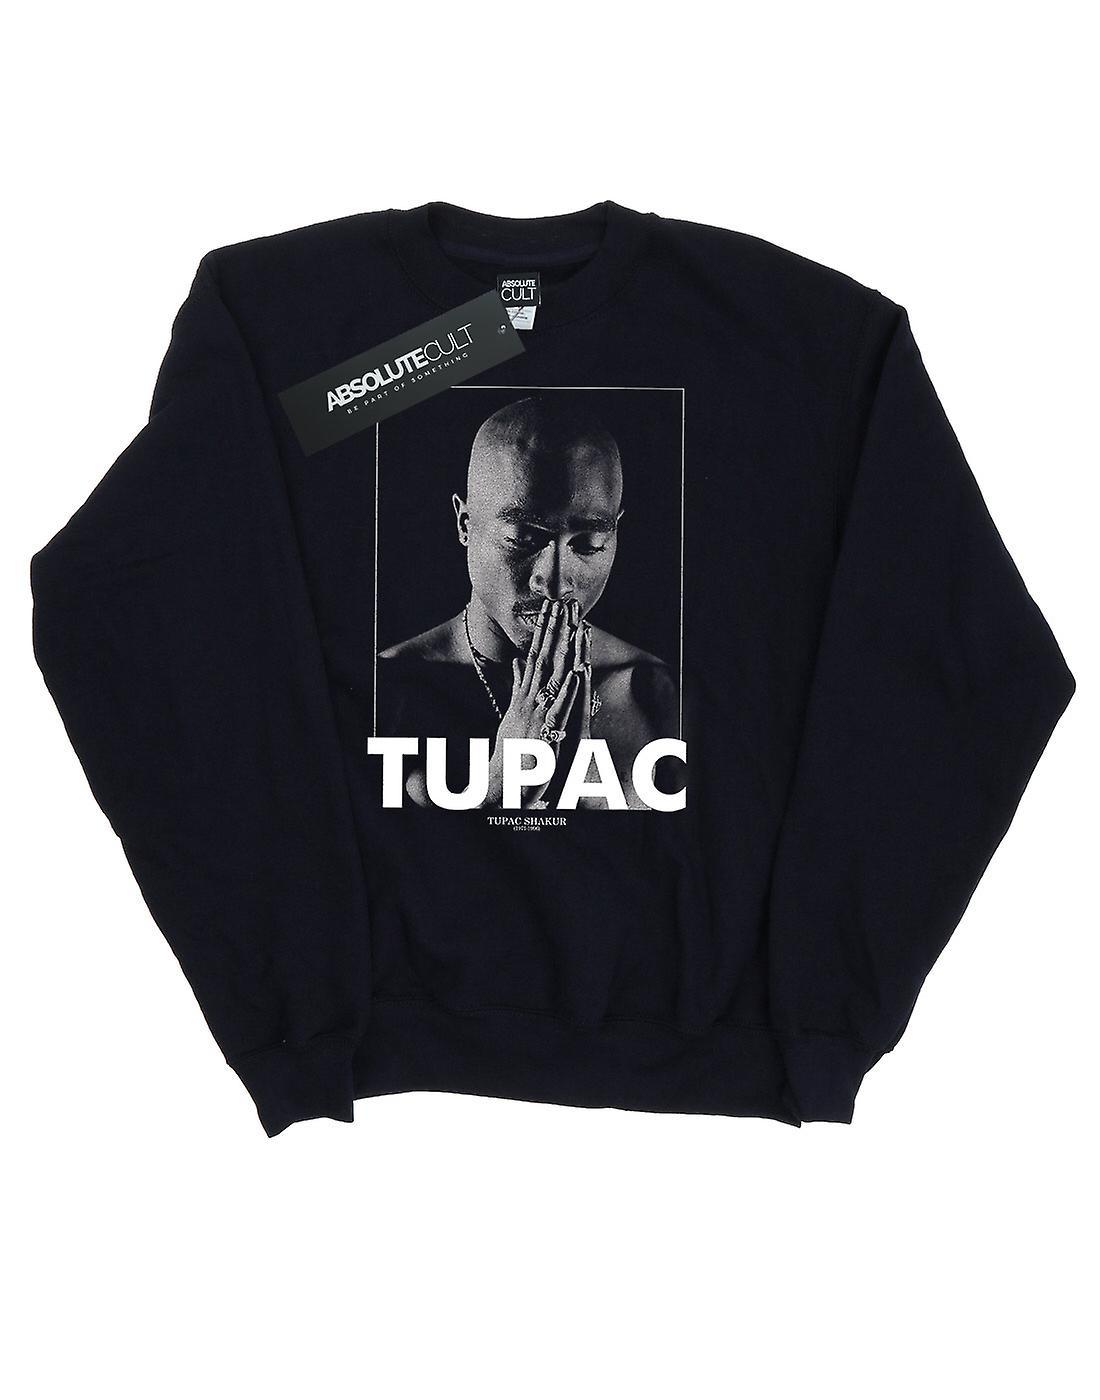 Tupac Shakur Adidas shirt, hoodie, sweater and v neck t shirt